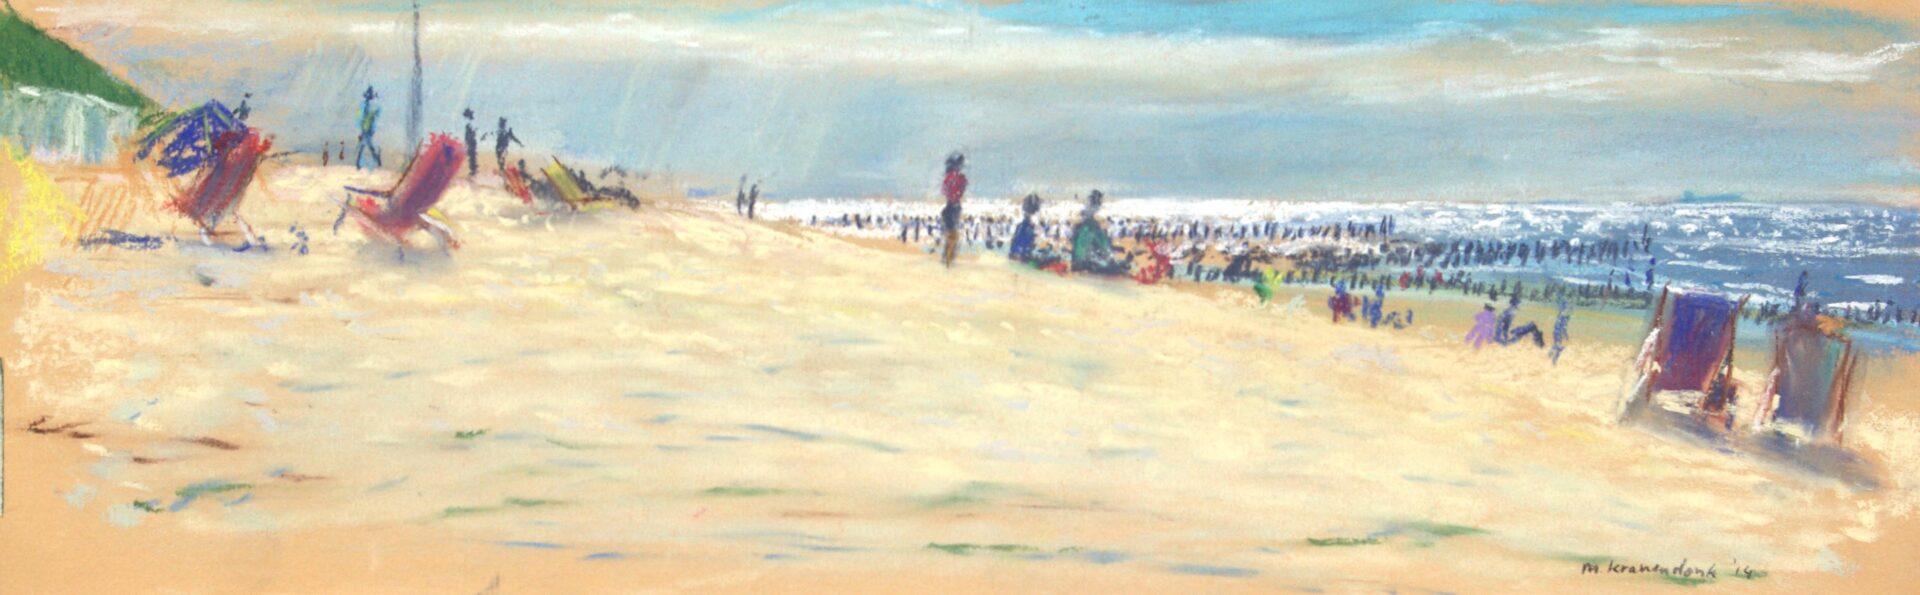 Pastel schilderij strand Domburg Zeeland avondlicht badgasten en strandstoelen